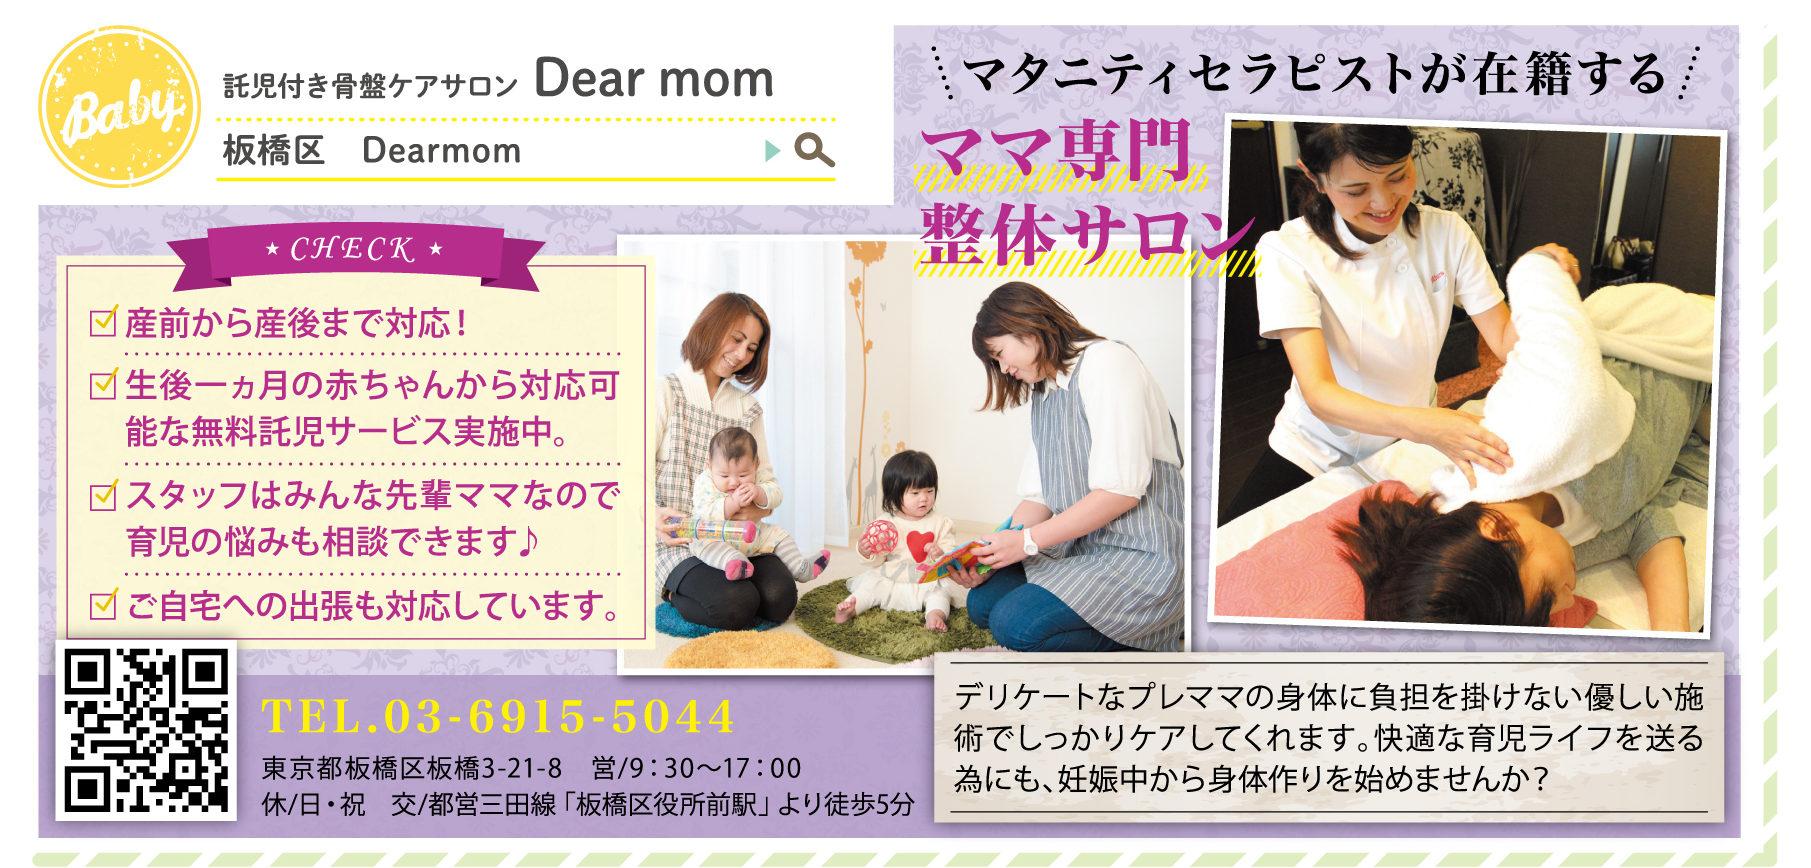 Dear mom様_9